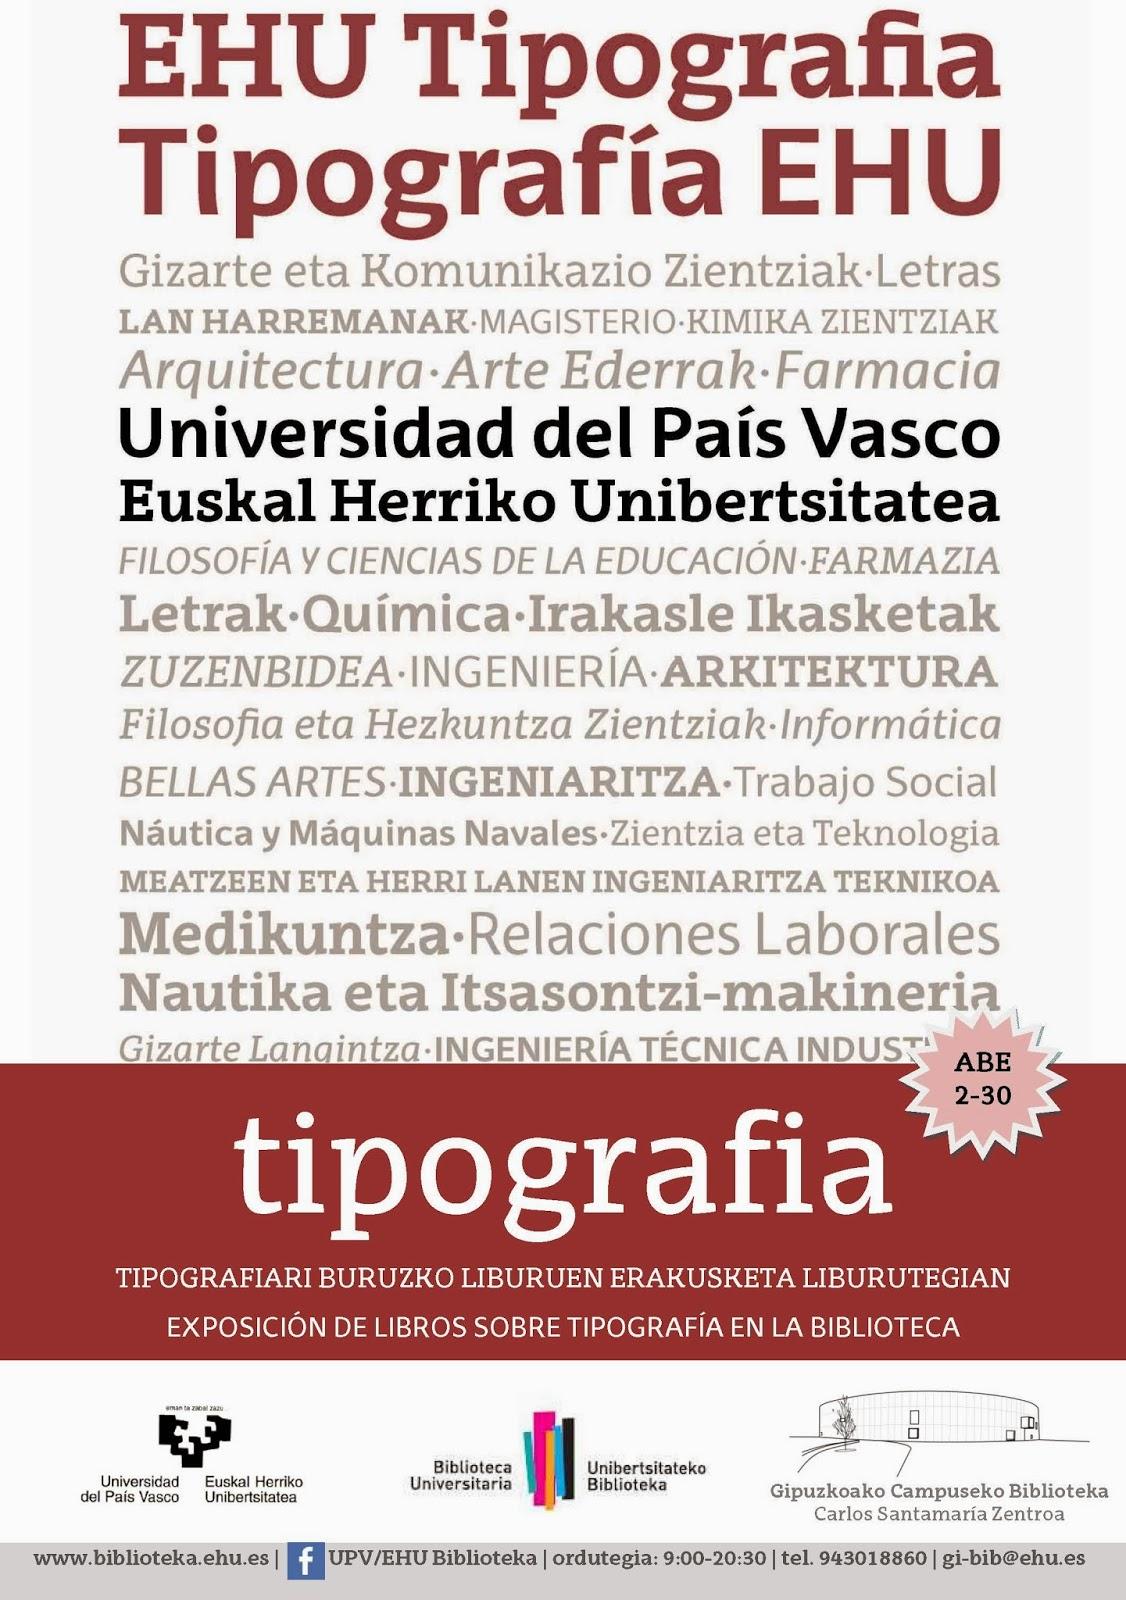 20131202-Tipografia-Kartela-1-TX